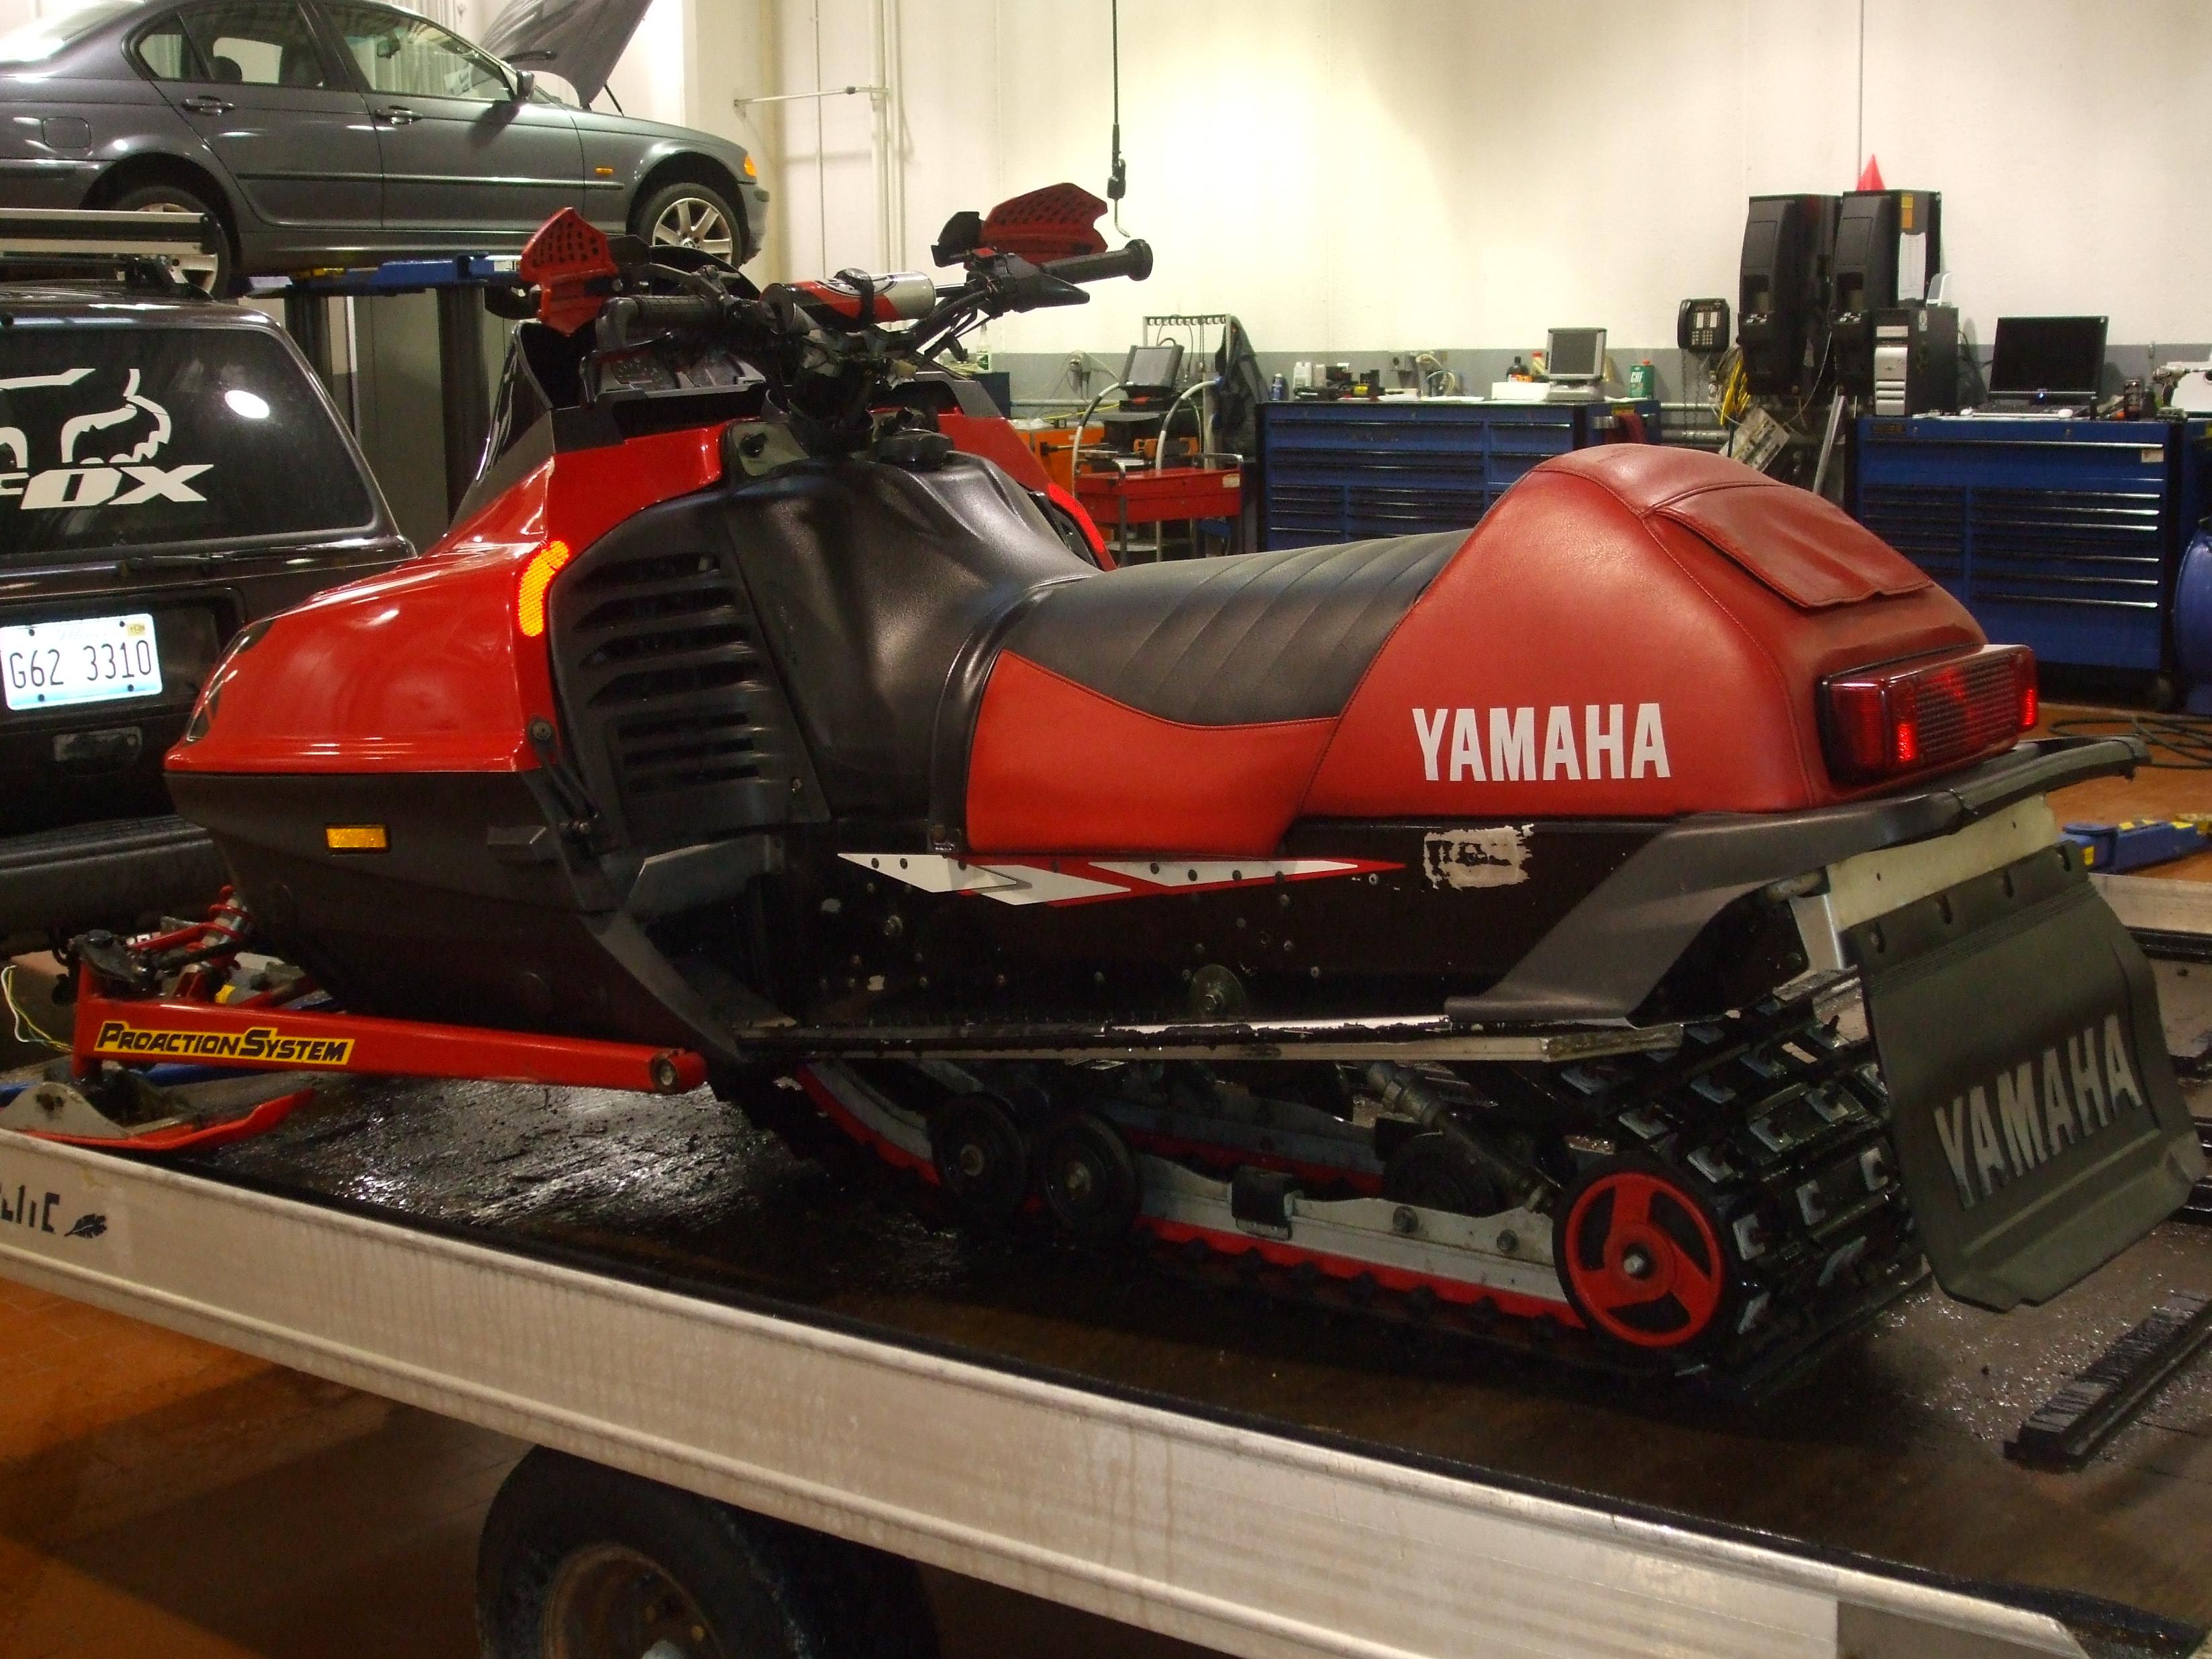 Yamaha Vmax For Sale